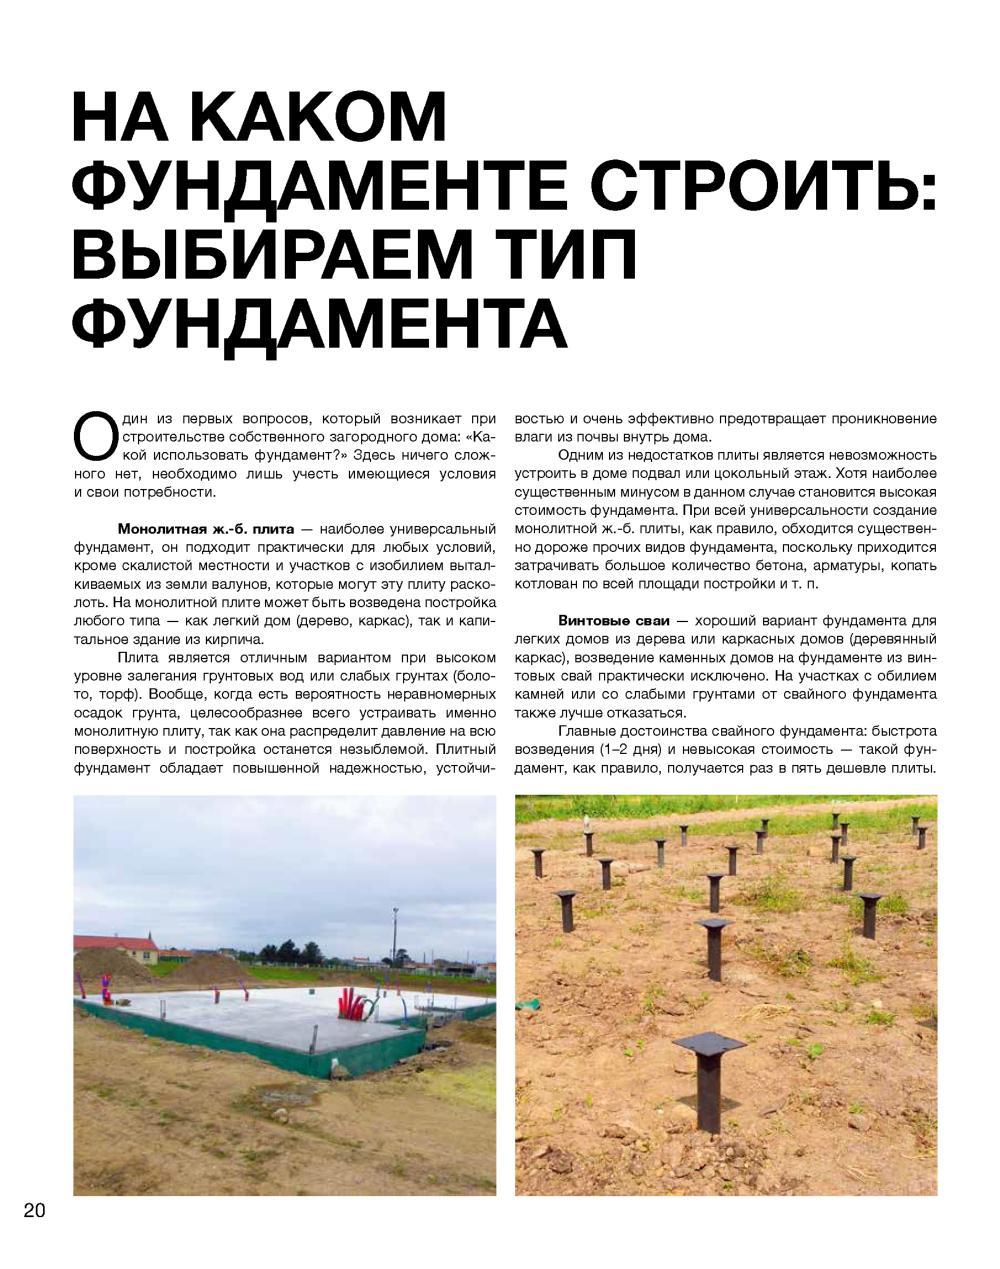 http://i2.imageban.ru/out/2014/01/17/38623d6b03132dde0b3d8802f6d88541.jpg